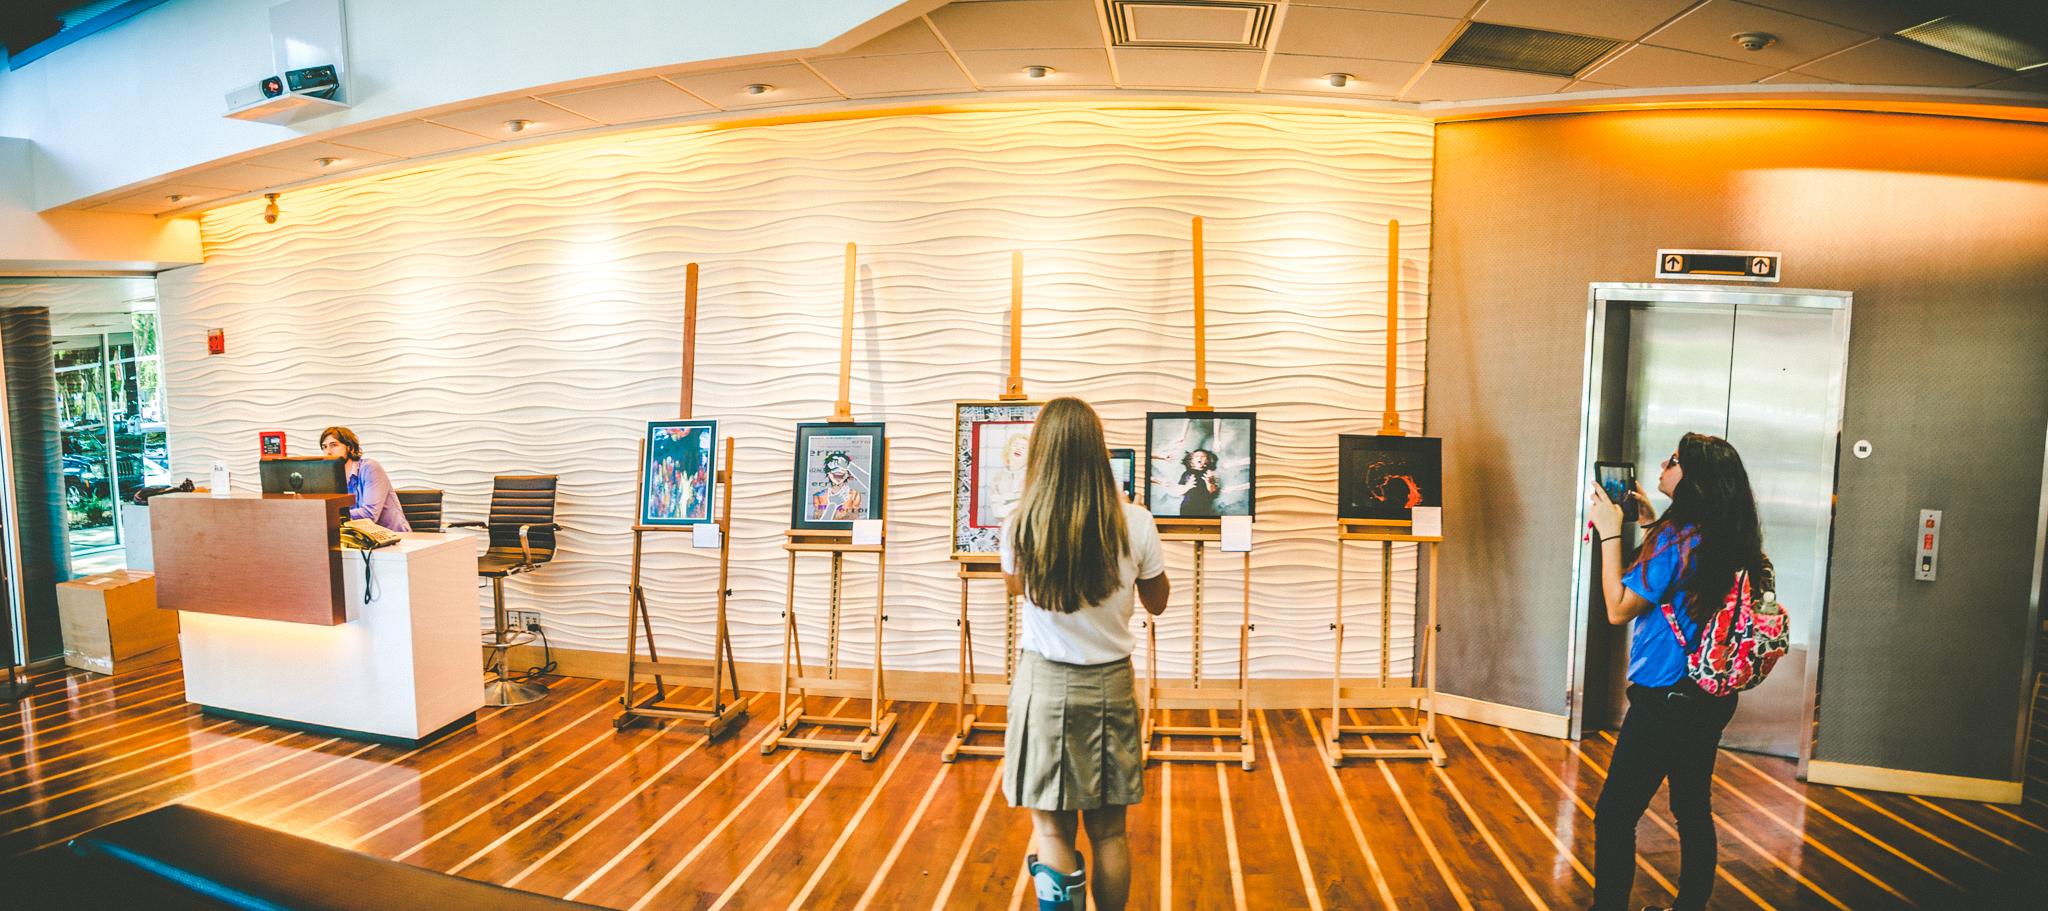 FS_LABS_One_School_of_the_Arts_Aug.25_08.jpg